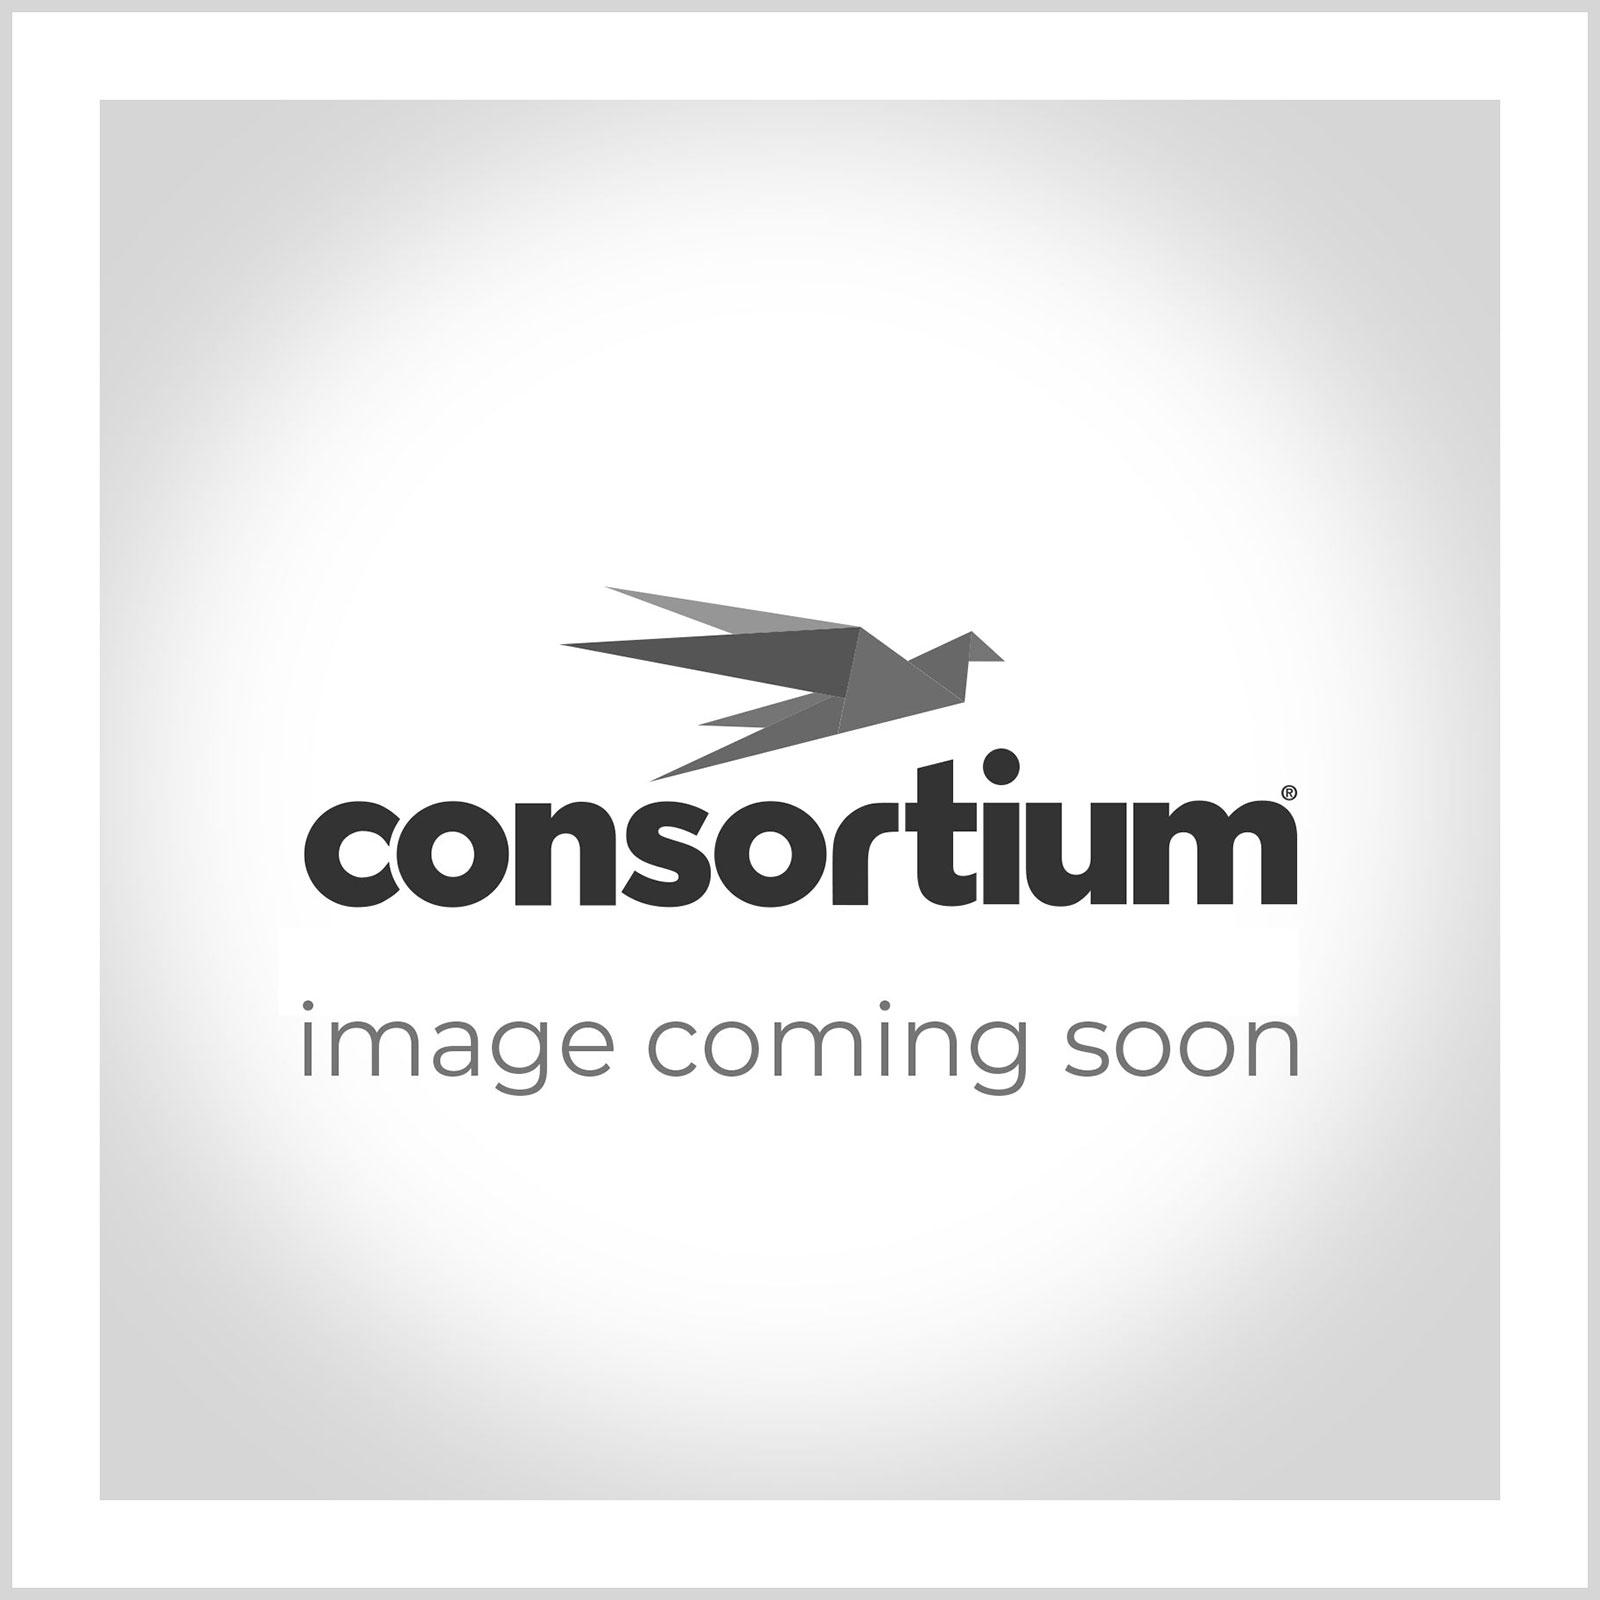 The Consortium Thin Art Card